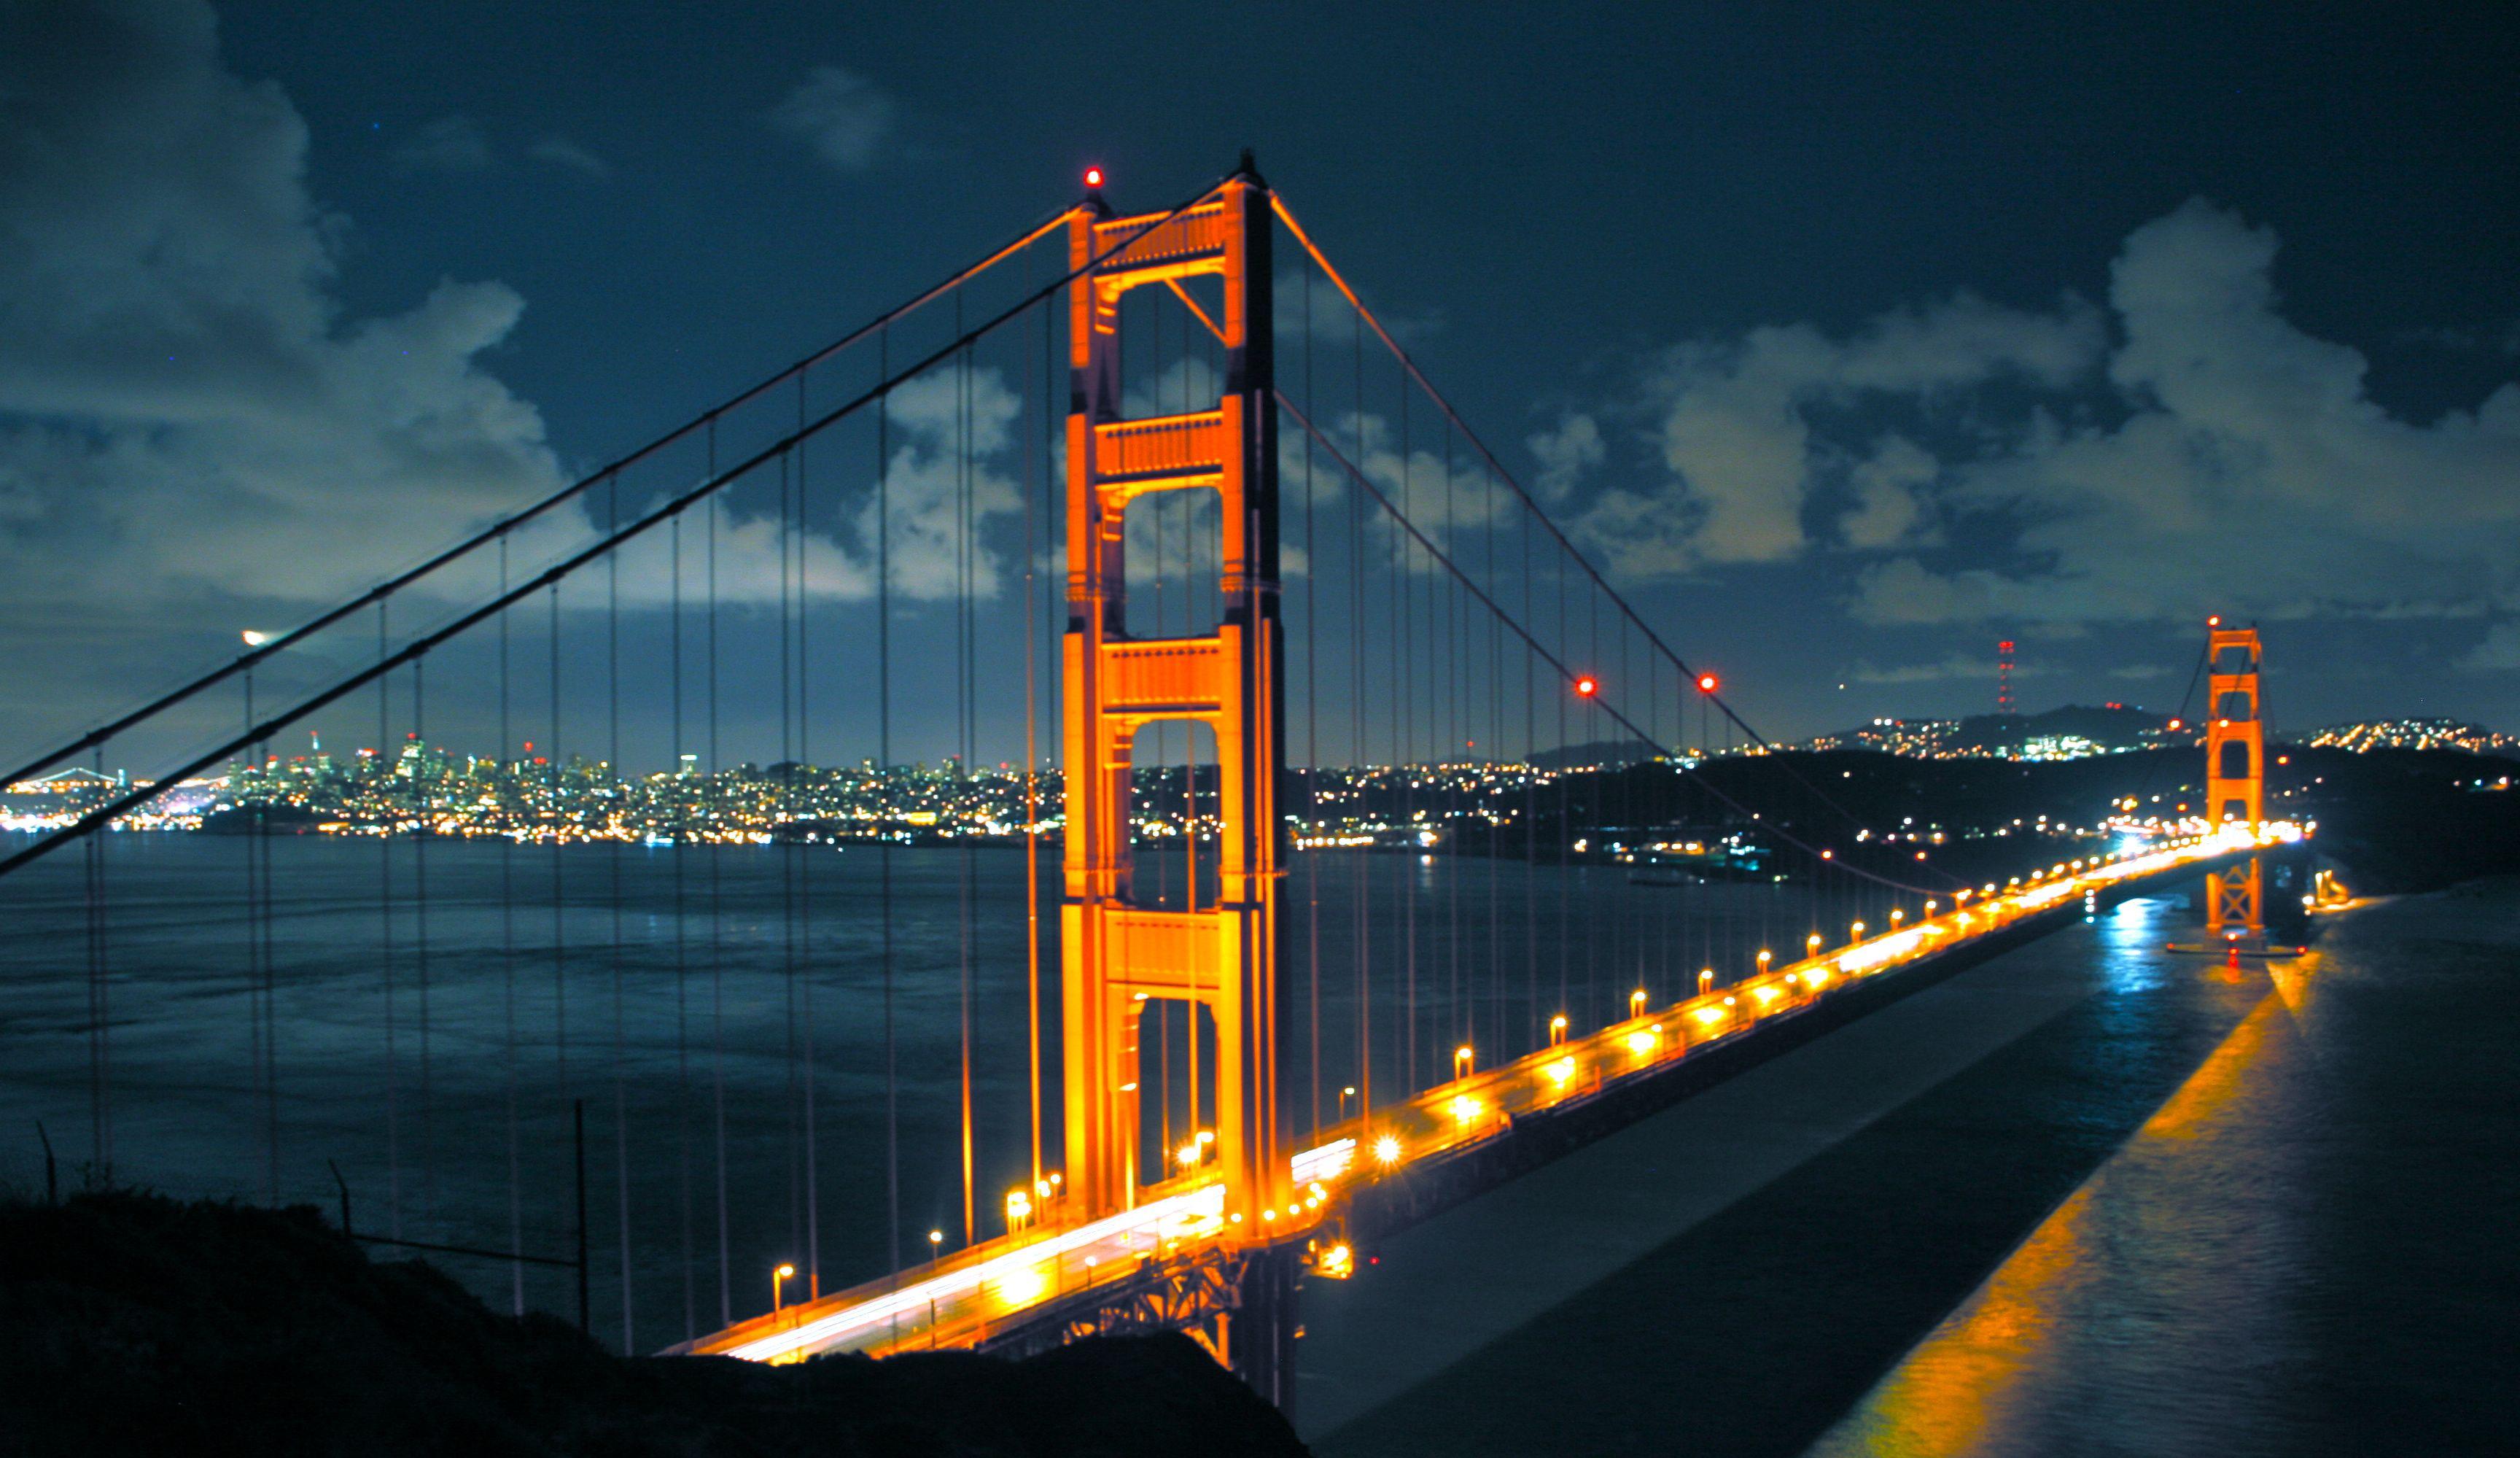 Golden-Gate-Bridge-HD-Wallpapers-Golden-Gate-Bridge-Wallpaper